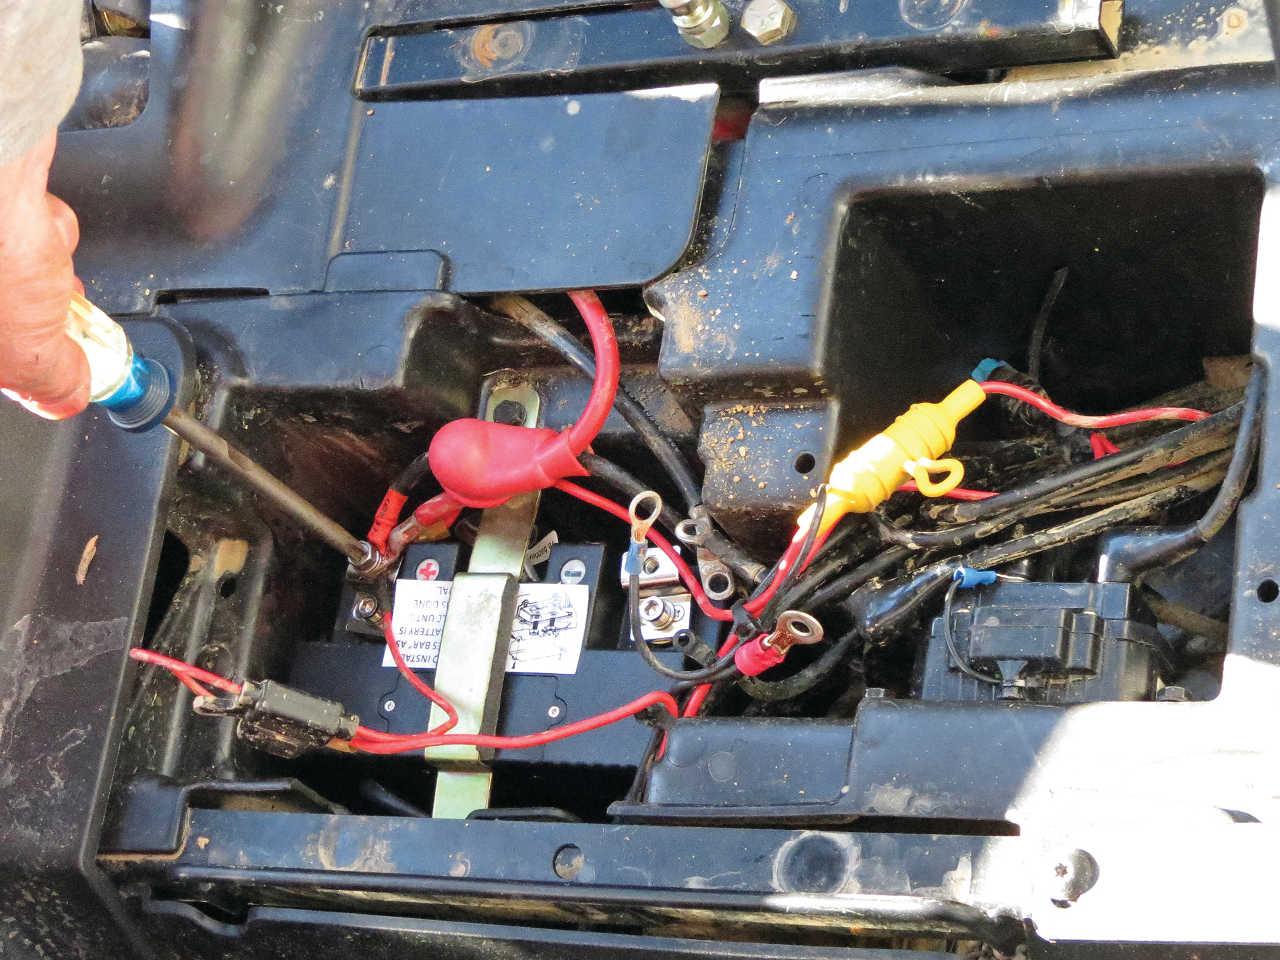 ... vendor.2014.shorai.lithium-iron-battery.installing.JPG